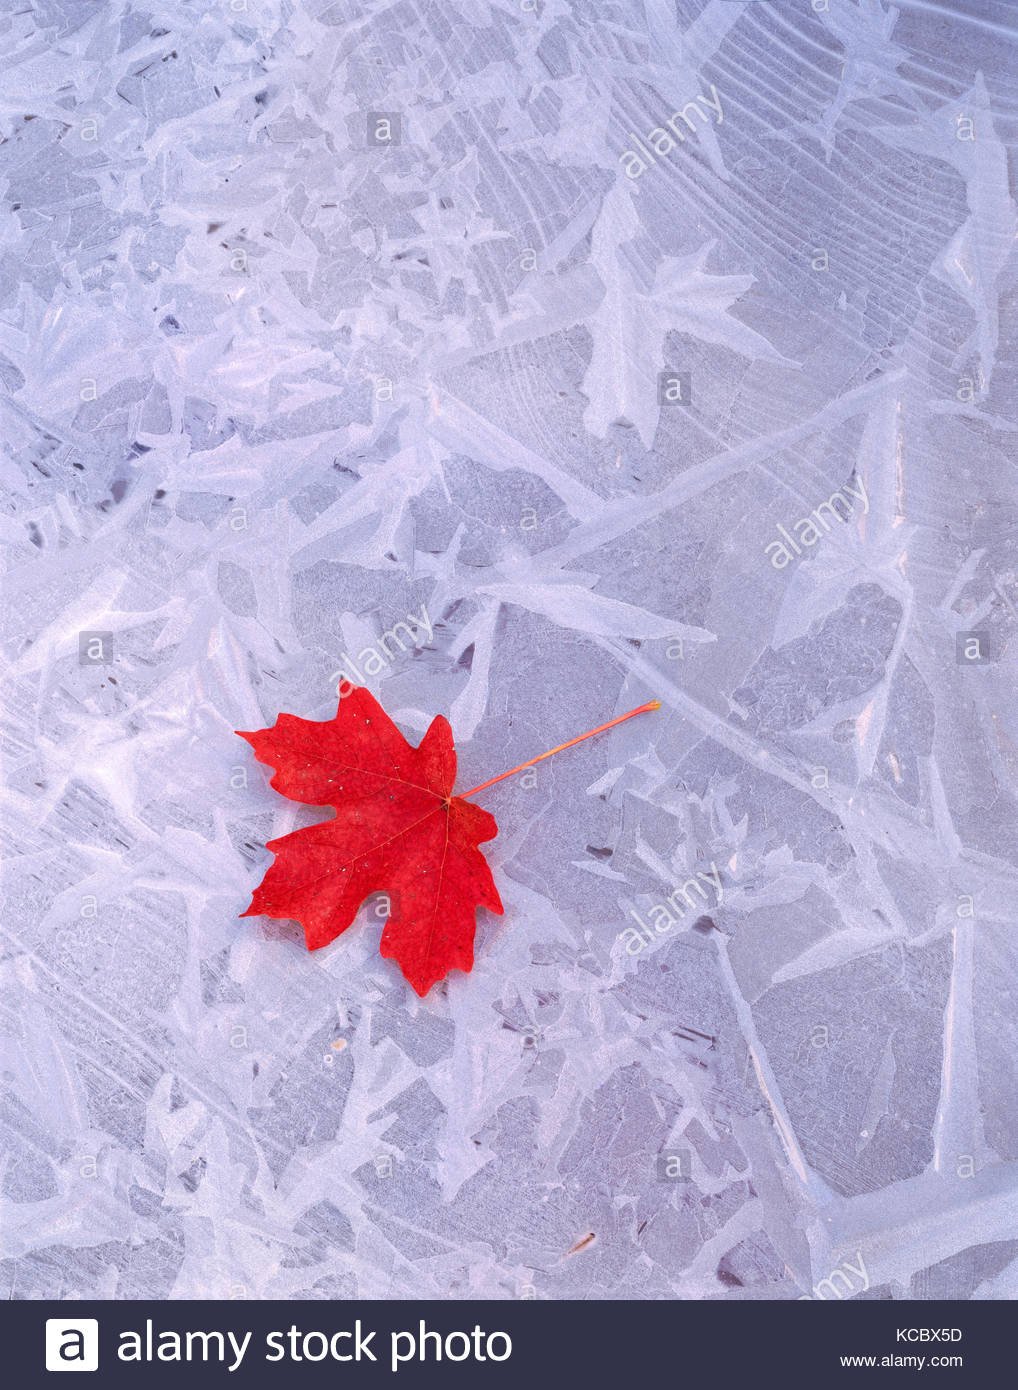 Bigtooth Maple Leaf on Ice, Zion National Park, Utah - Stock Image